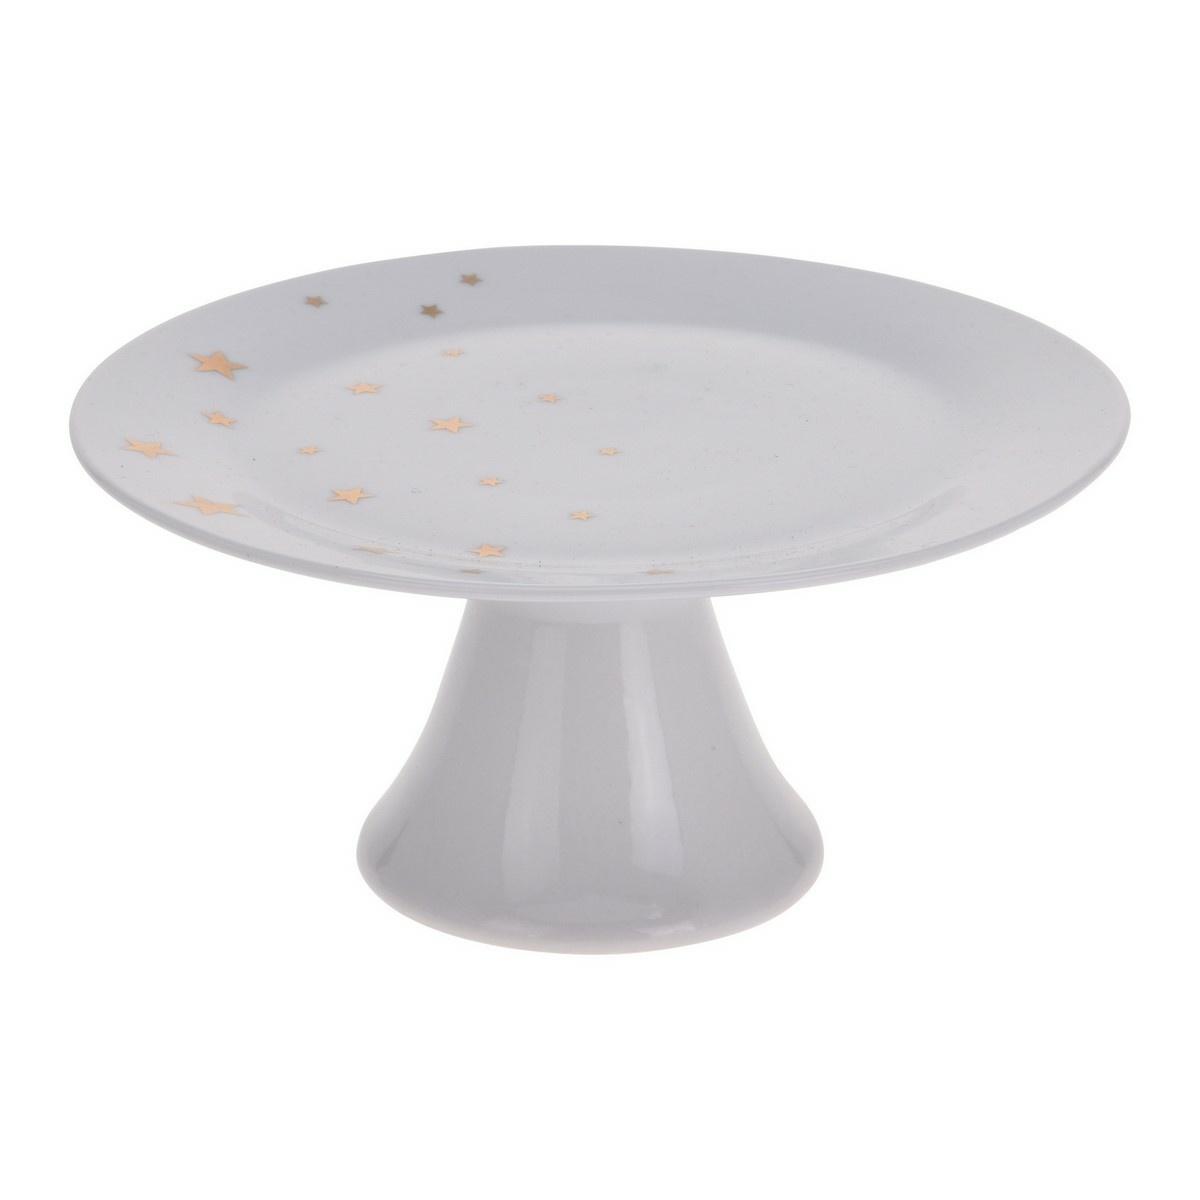 Porcelánový servírovací podnos, 21 cm